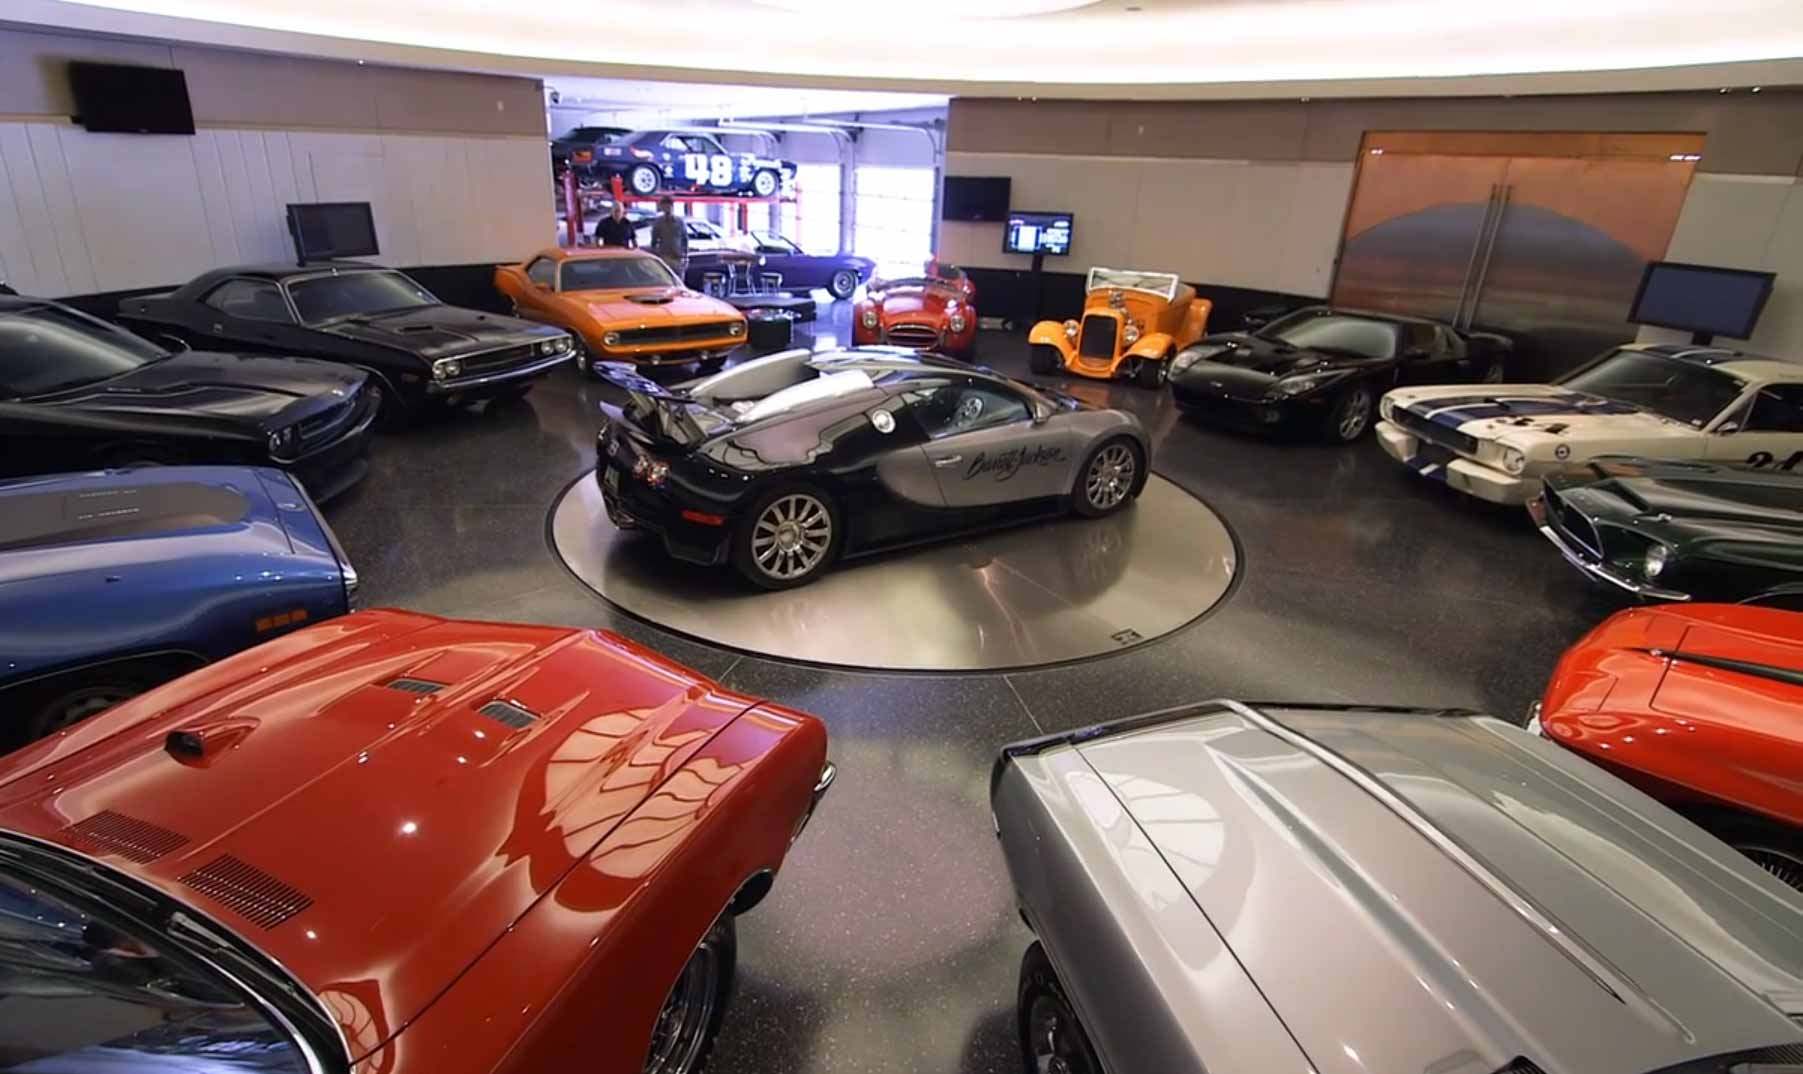 Million dollar garages bing images for Car turntable plans